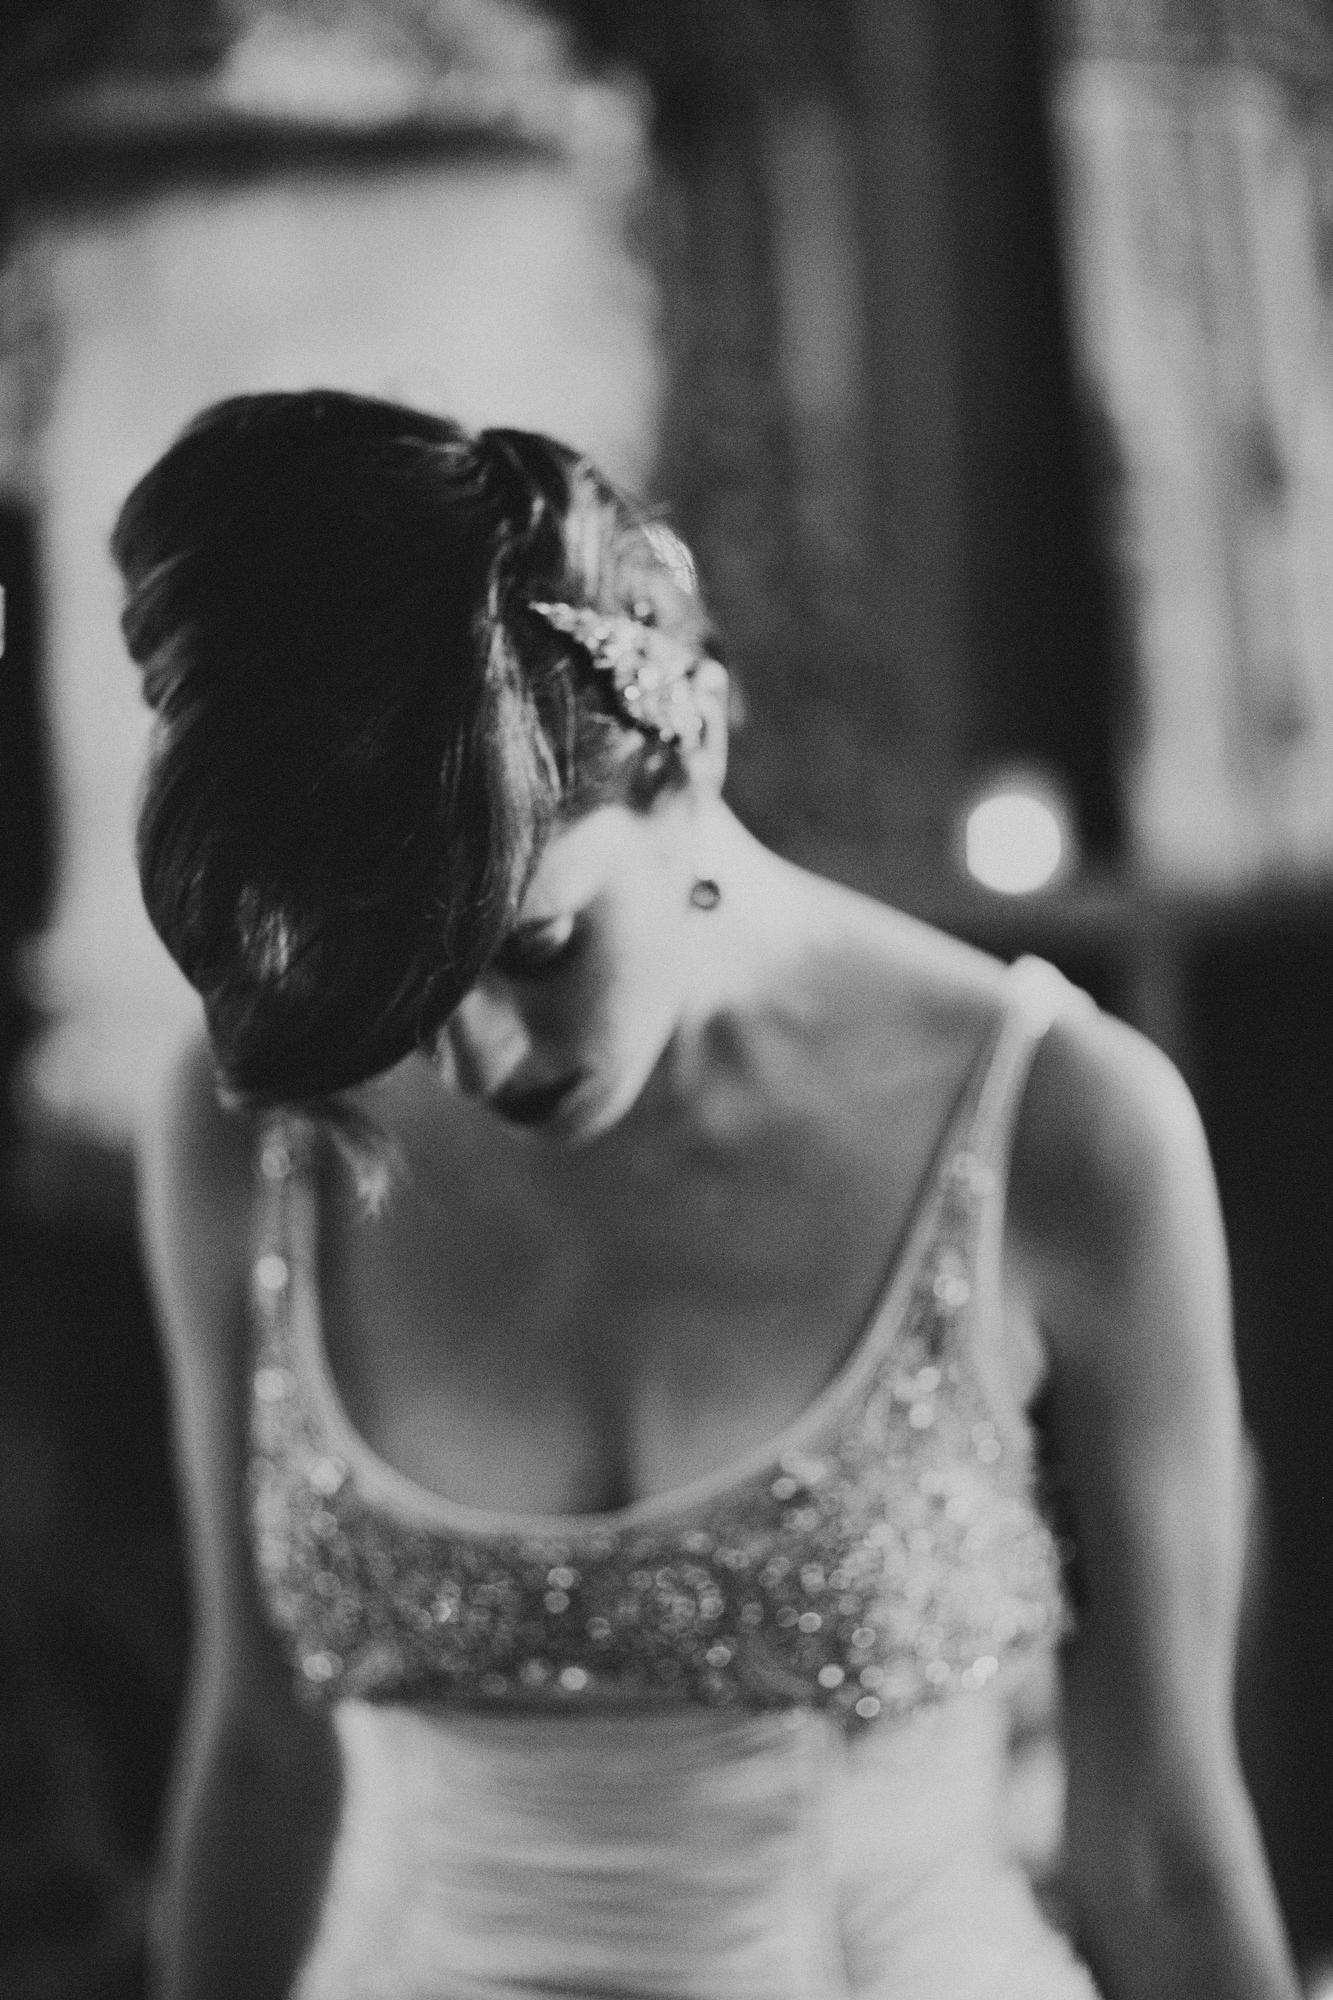 jennifer-skog-bridal-fashion-photographer-lifestyle-0001.jpg